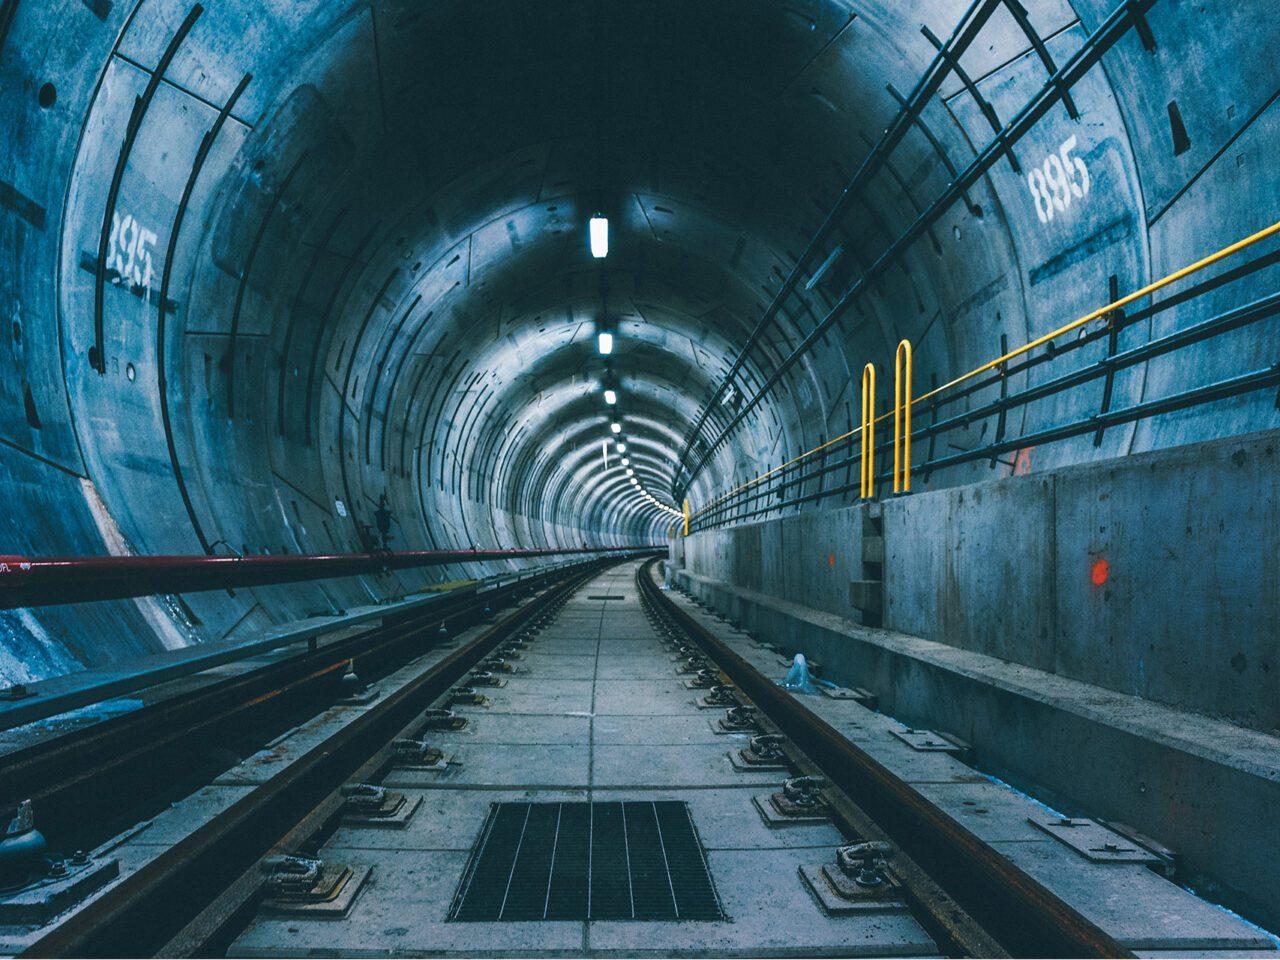 How Do Railways Impact The Environment?